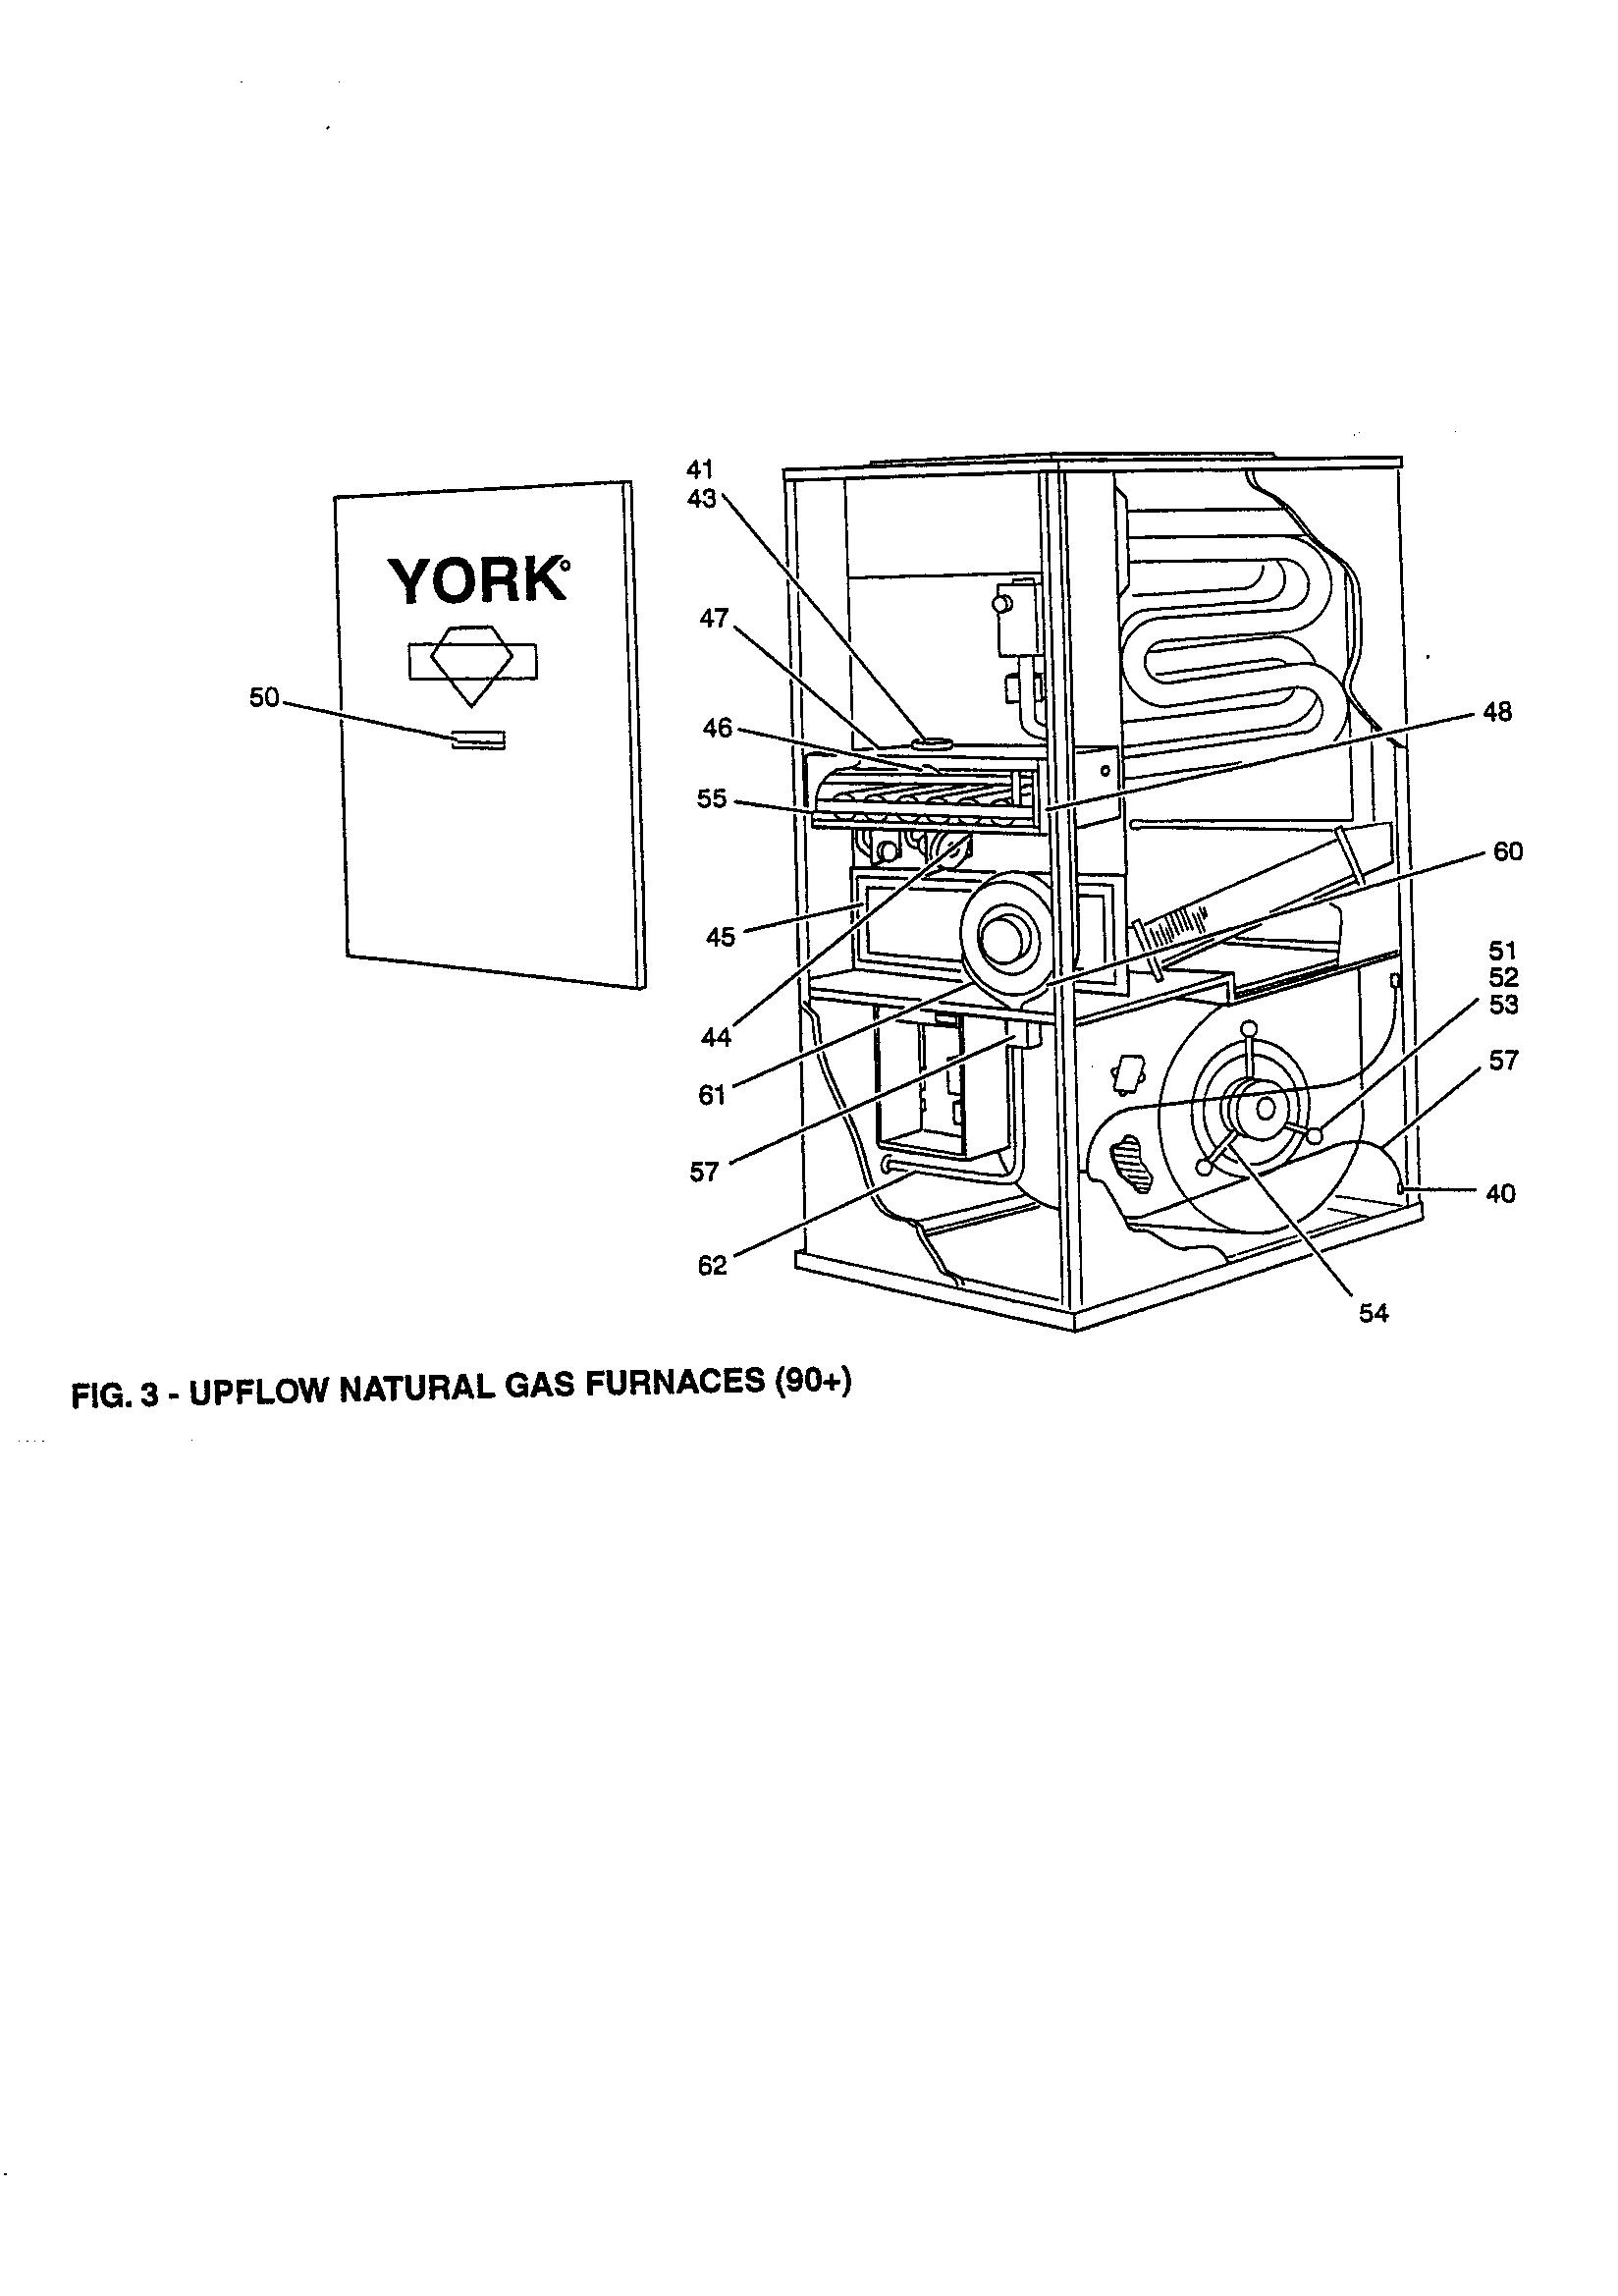 (74 parts)